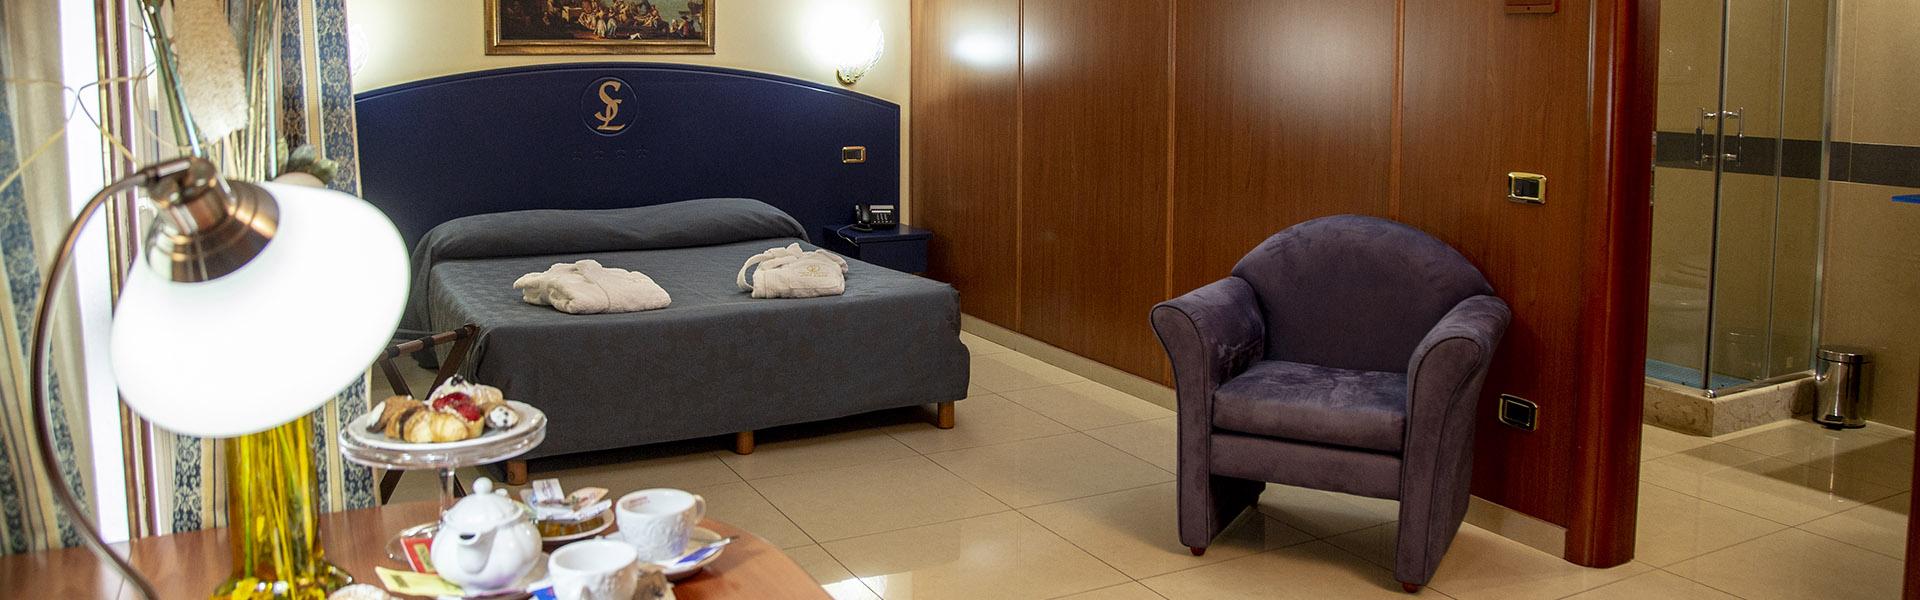 camere hotel san luca